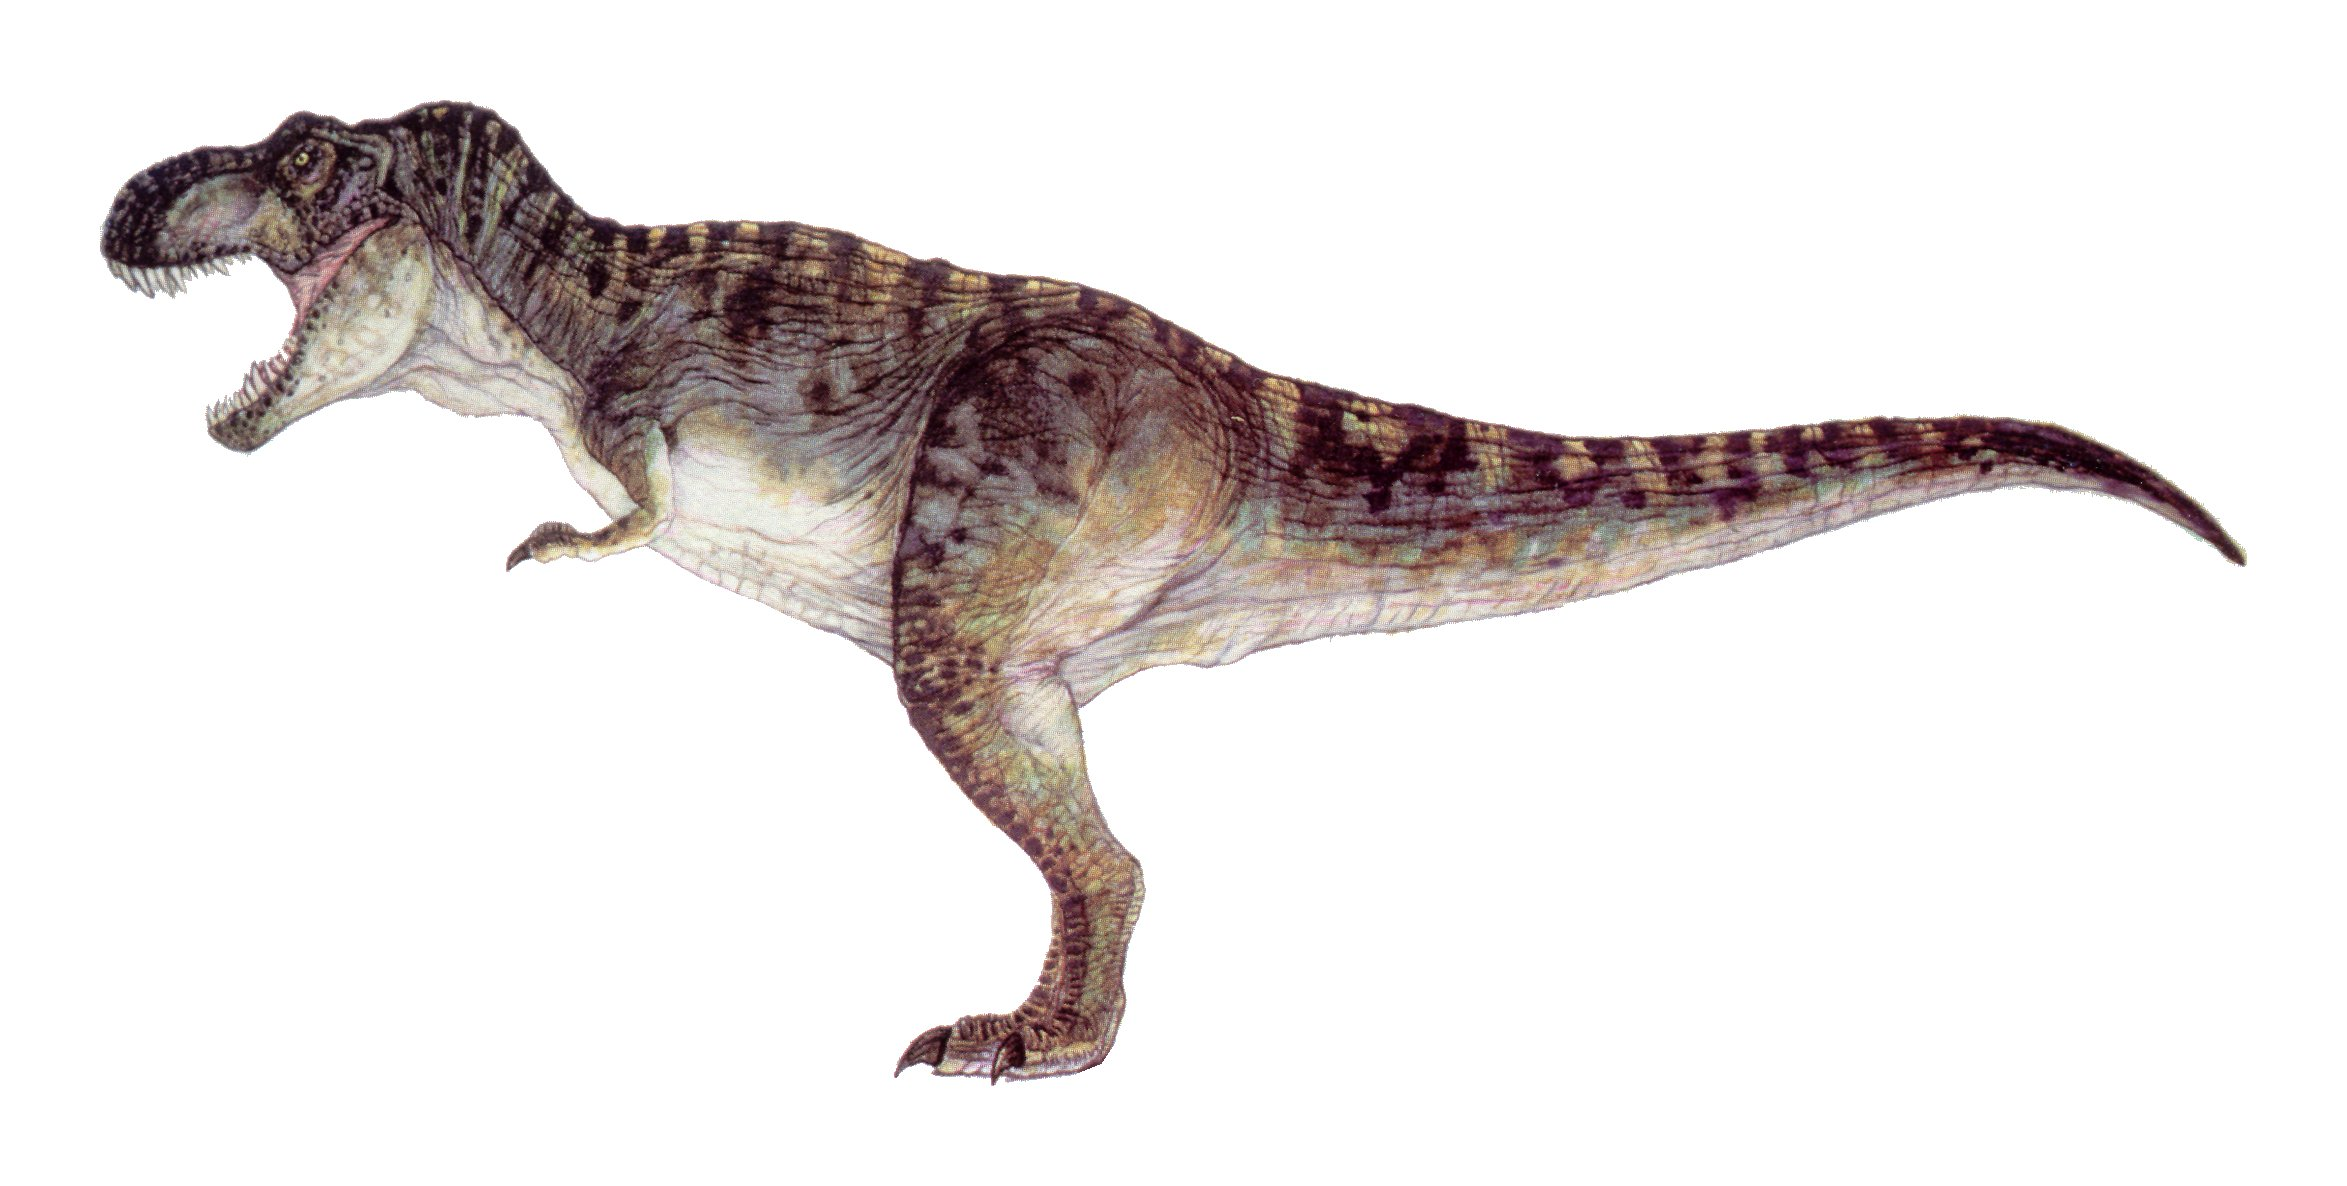 #ZNCine - Especial Jurassic Park. La trilogía original que ... T Rex The Lost World Jurassic Park